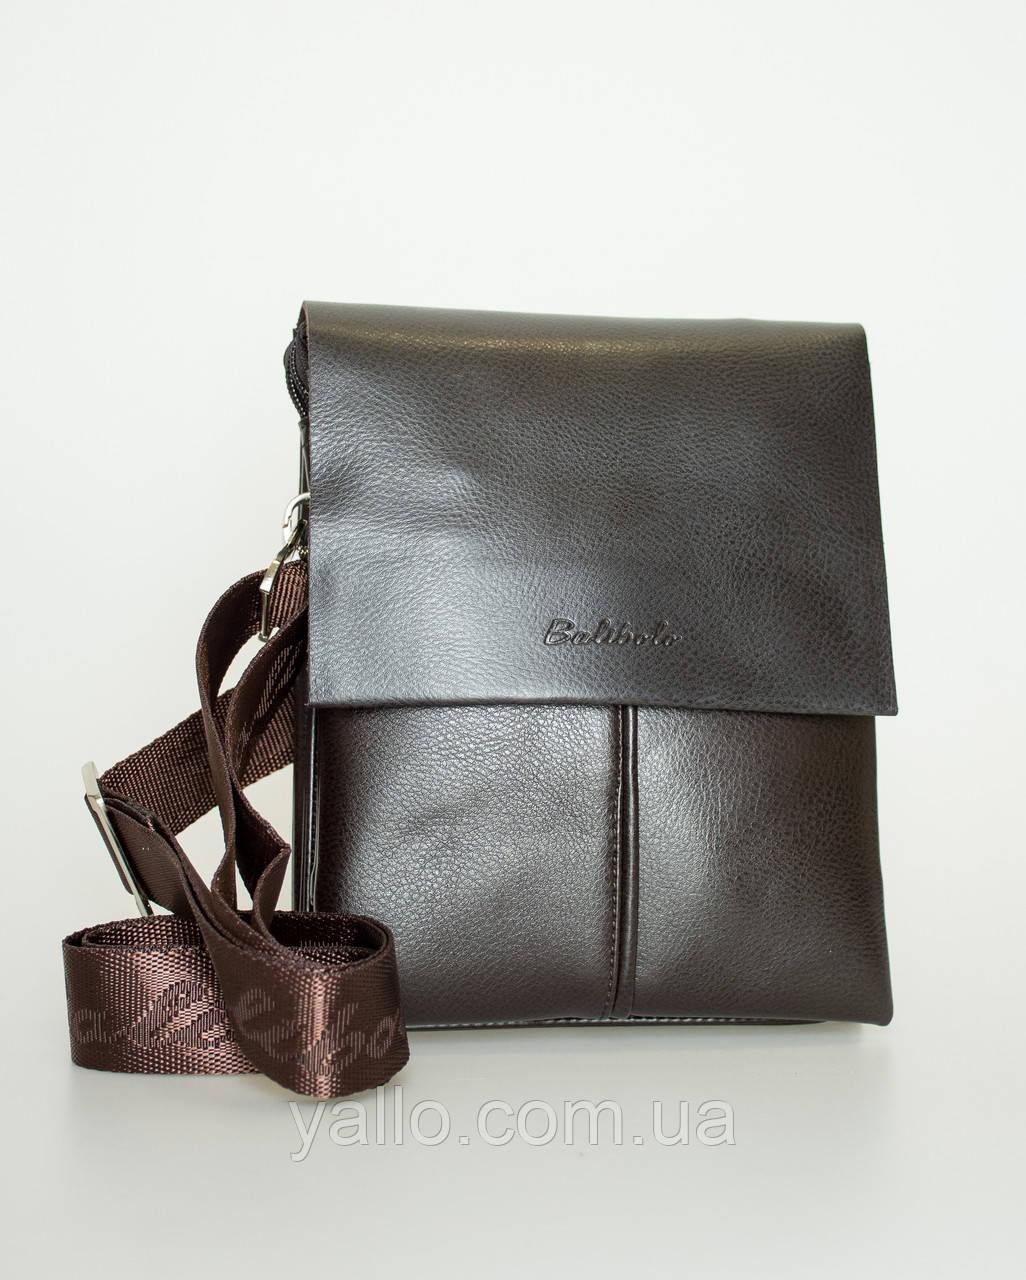 Мужская сумка Balibolo из Эко Кожи